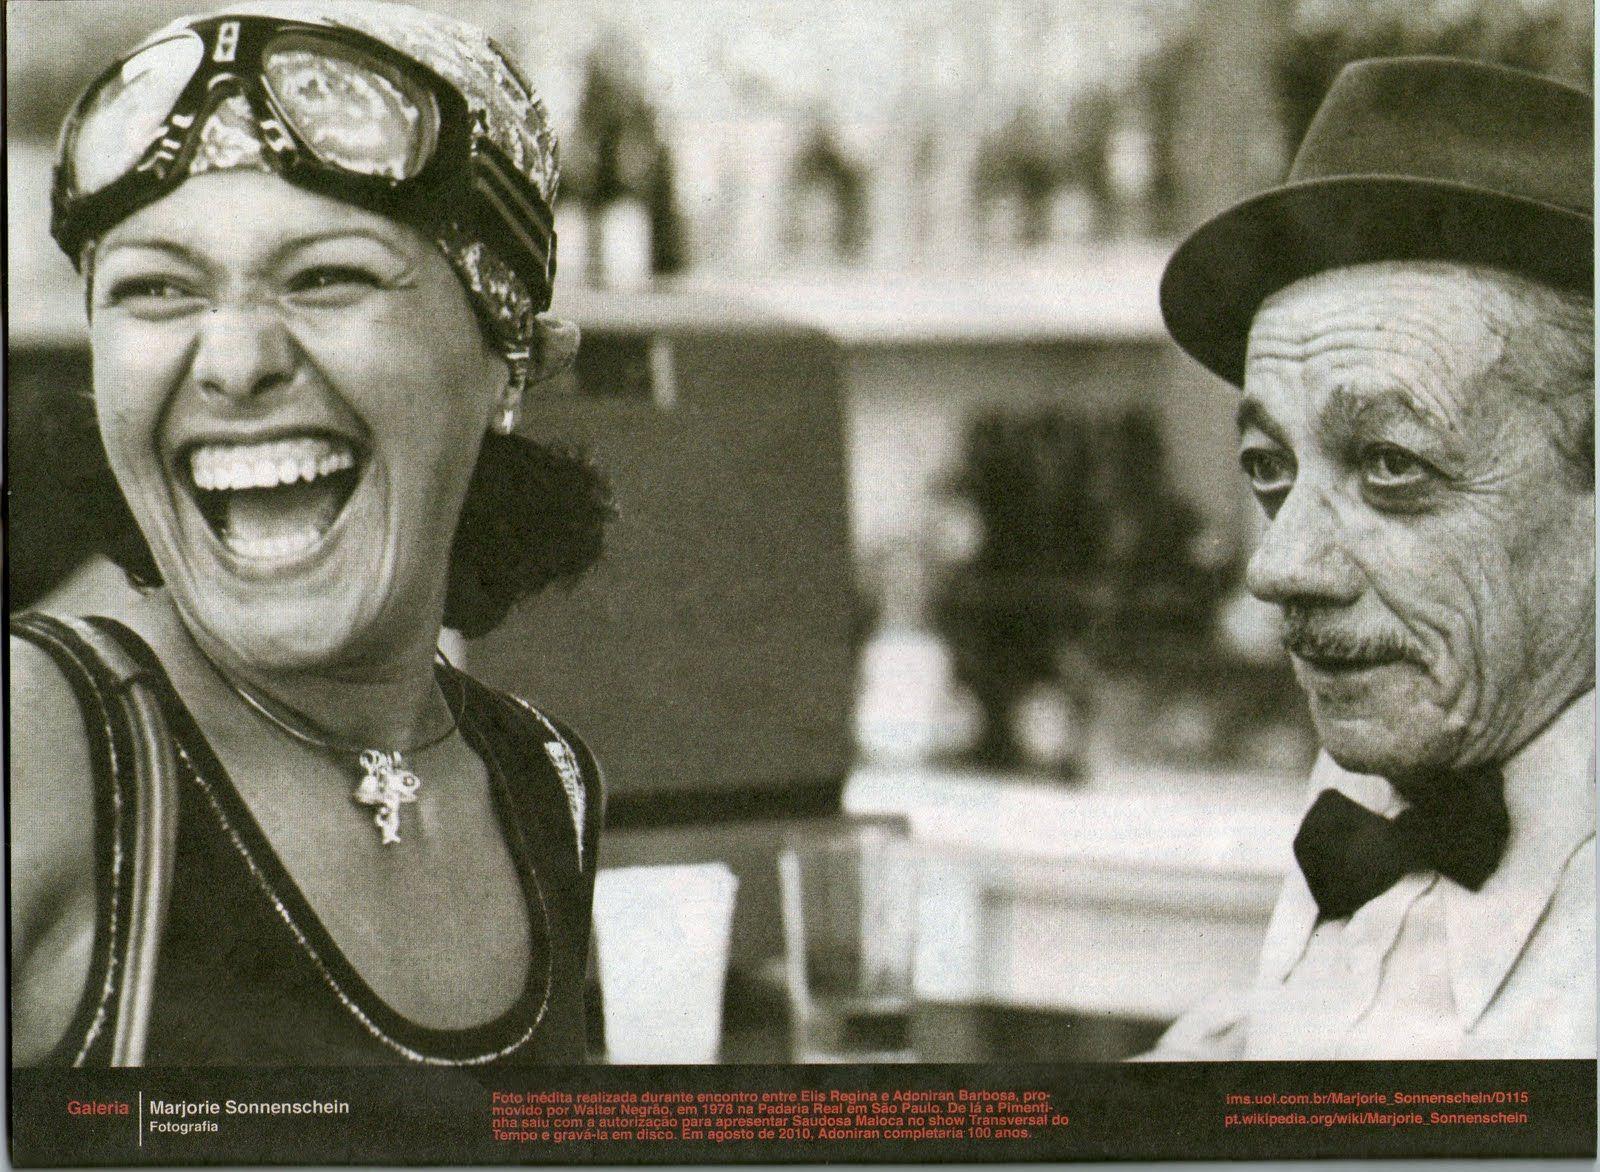 Elis Regina & Adoniran Barbosa   Music I like   Samba, Music, Music love